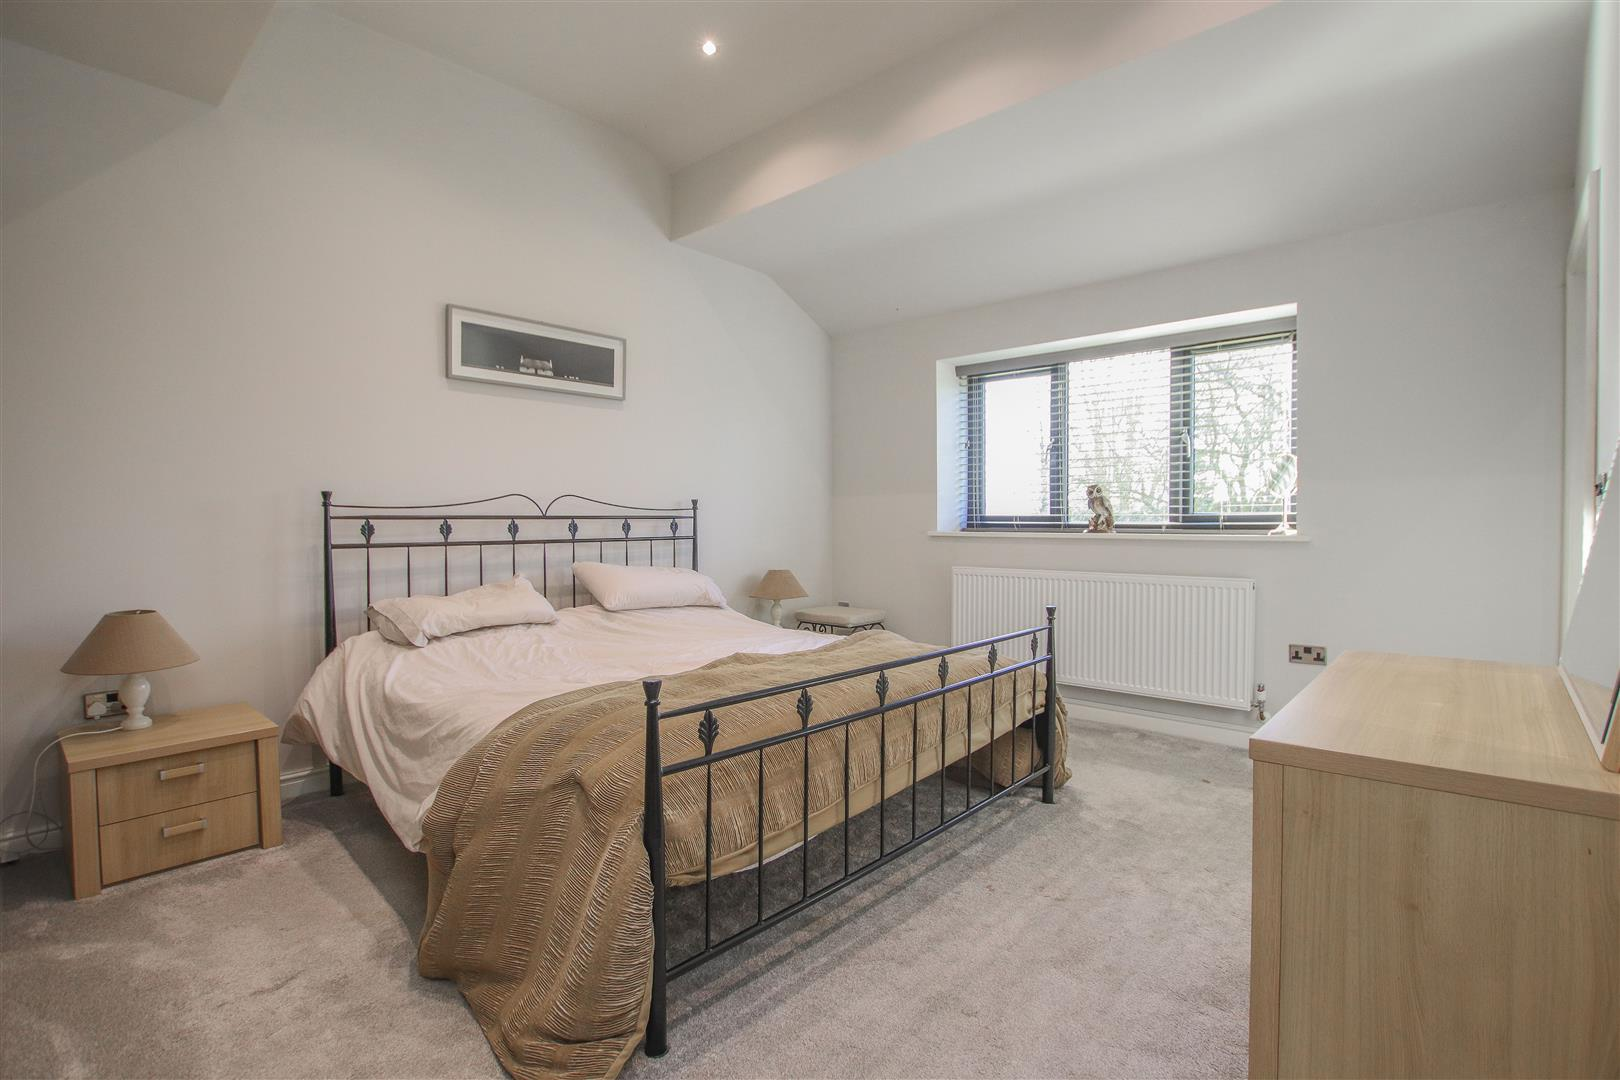 6 Bedroom Barn Conversion For Sale - 24.JPG